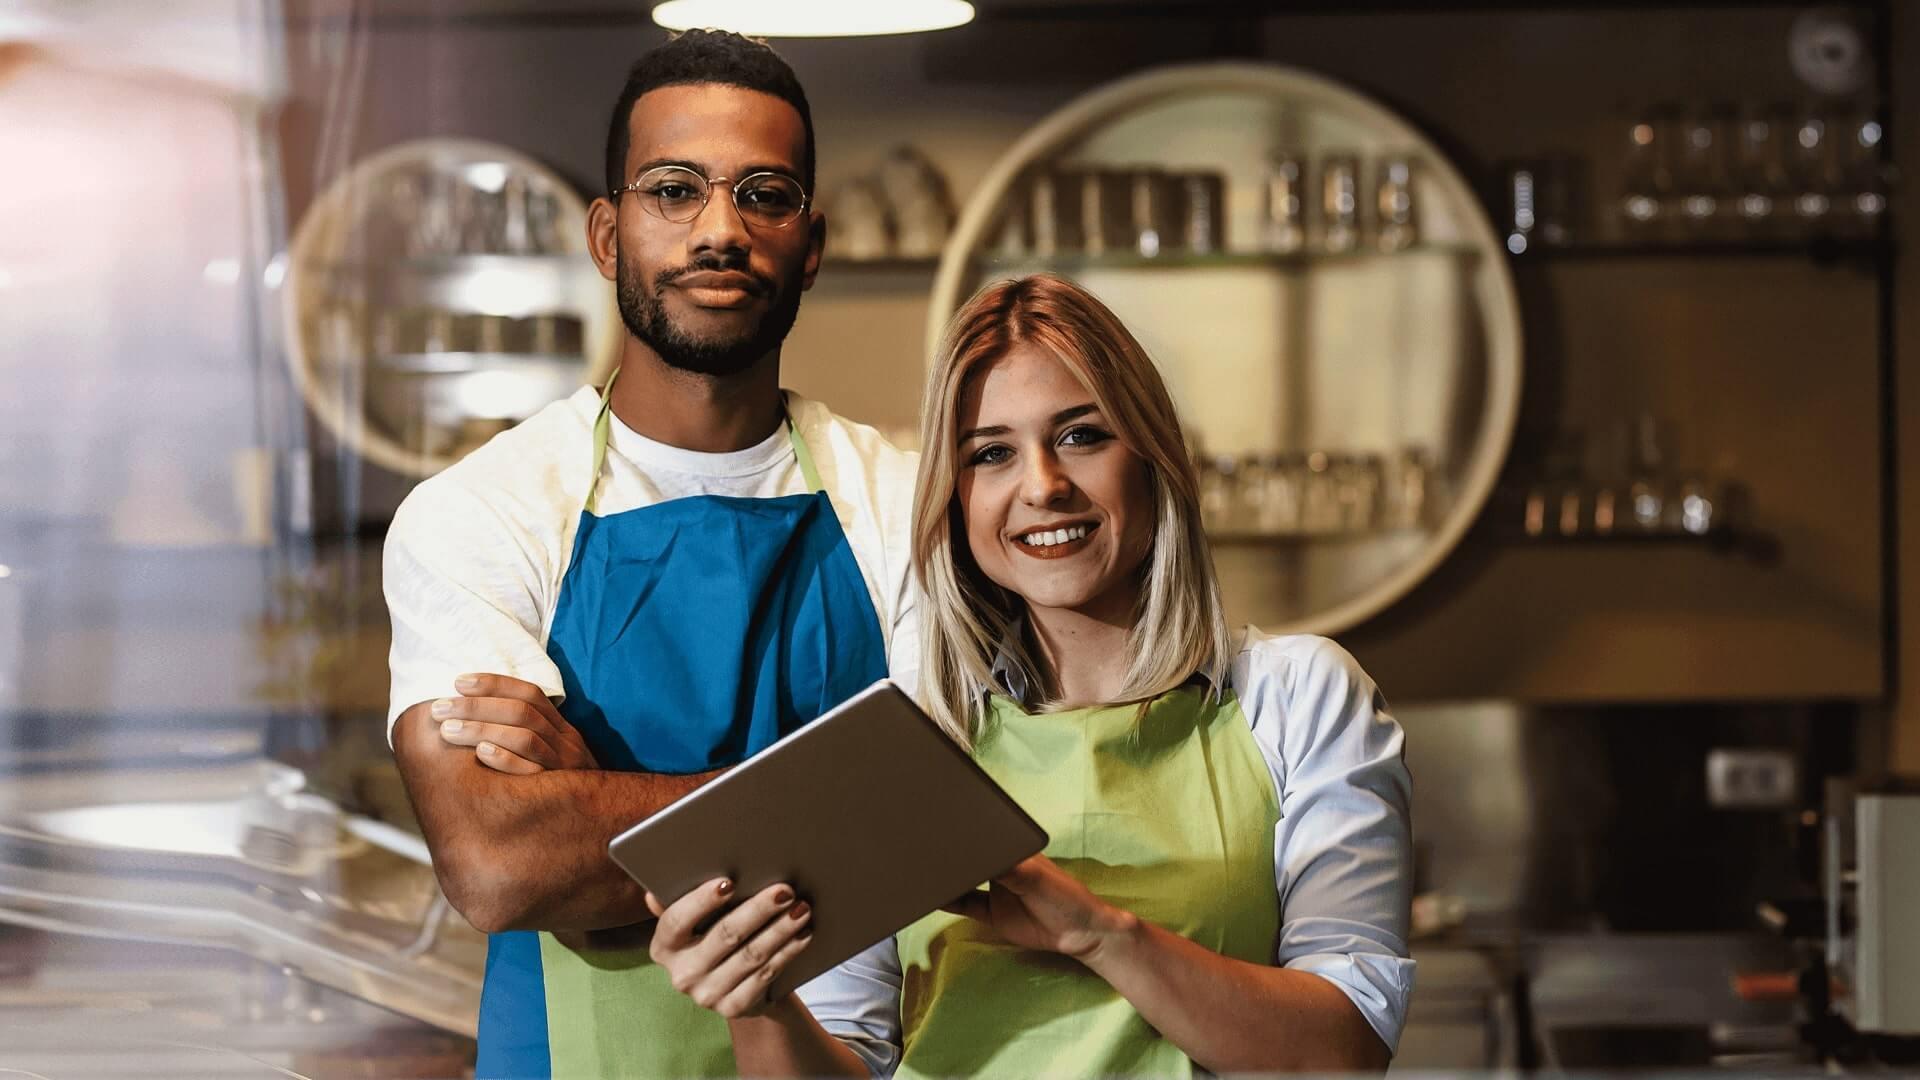 empreendedores curso online gestao processos financeira marketing pessoas processos empresas empreendedor ead cmpe es